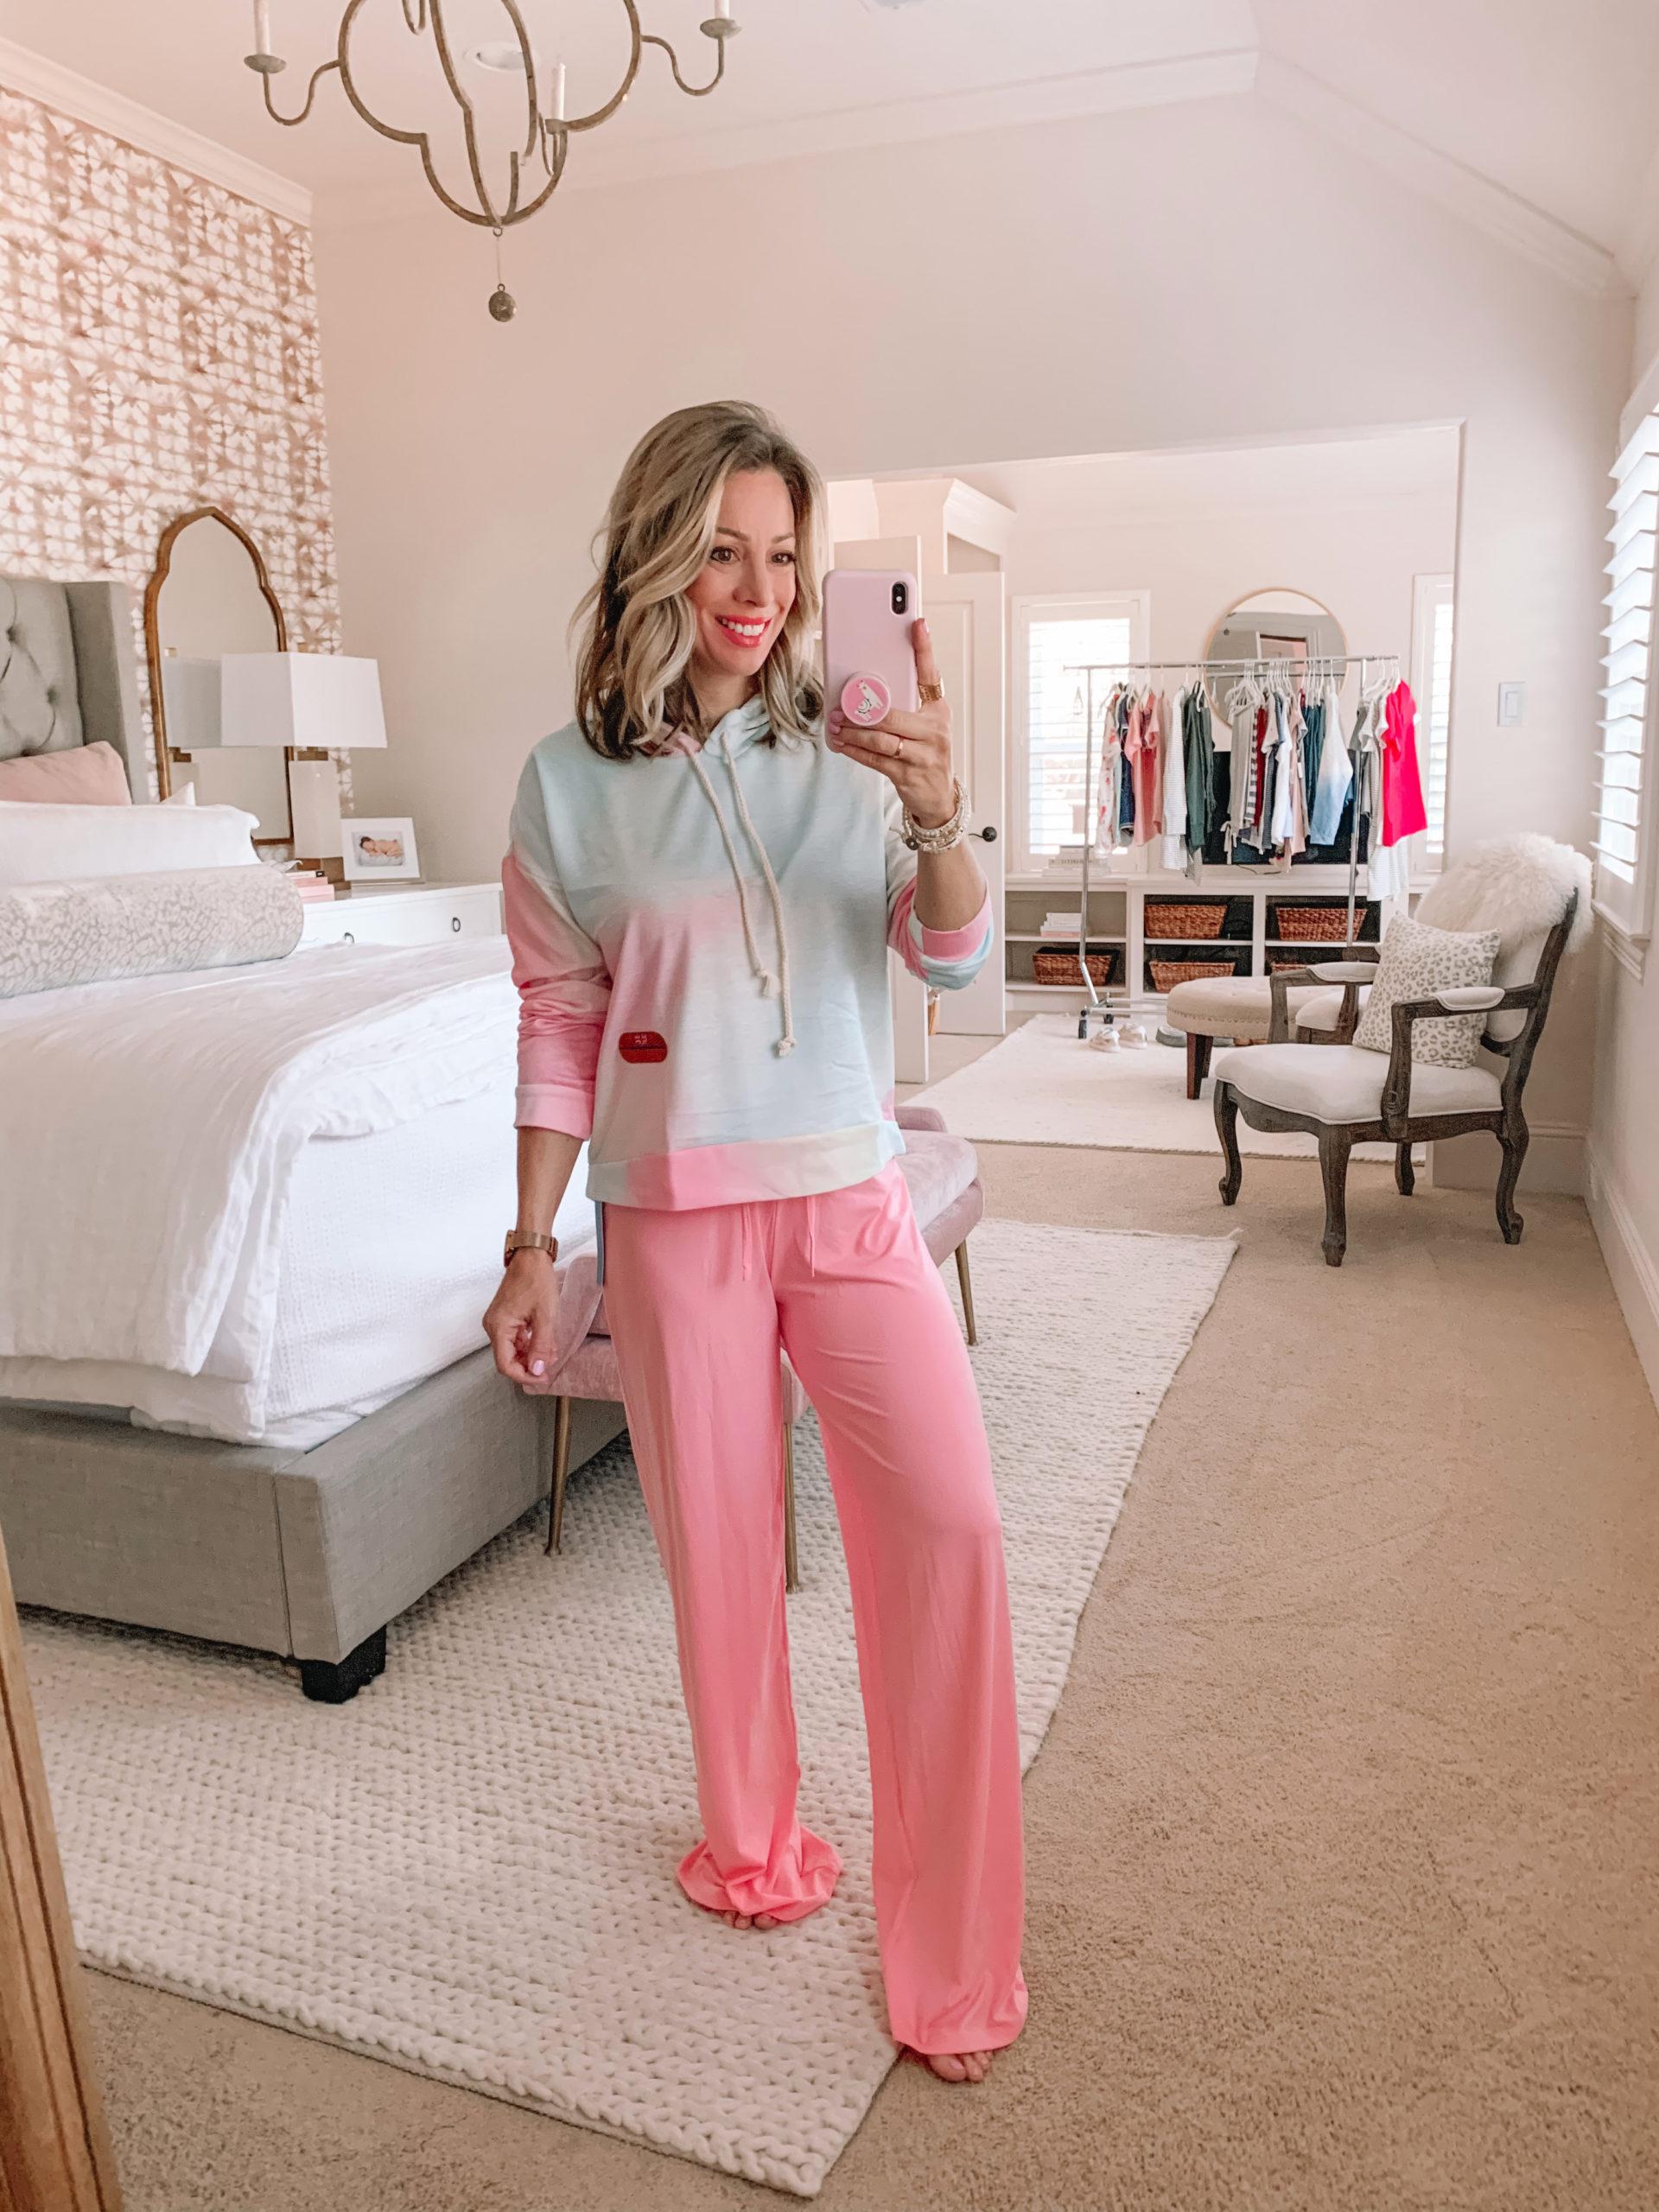 Amazon Haul - Pink Tie Dye Hoodie, Pink Lounge Pants